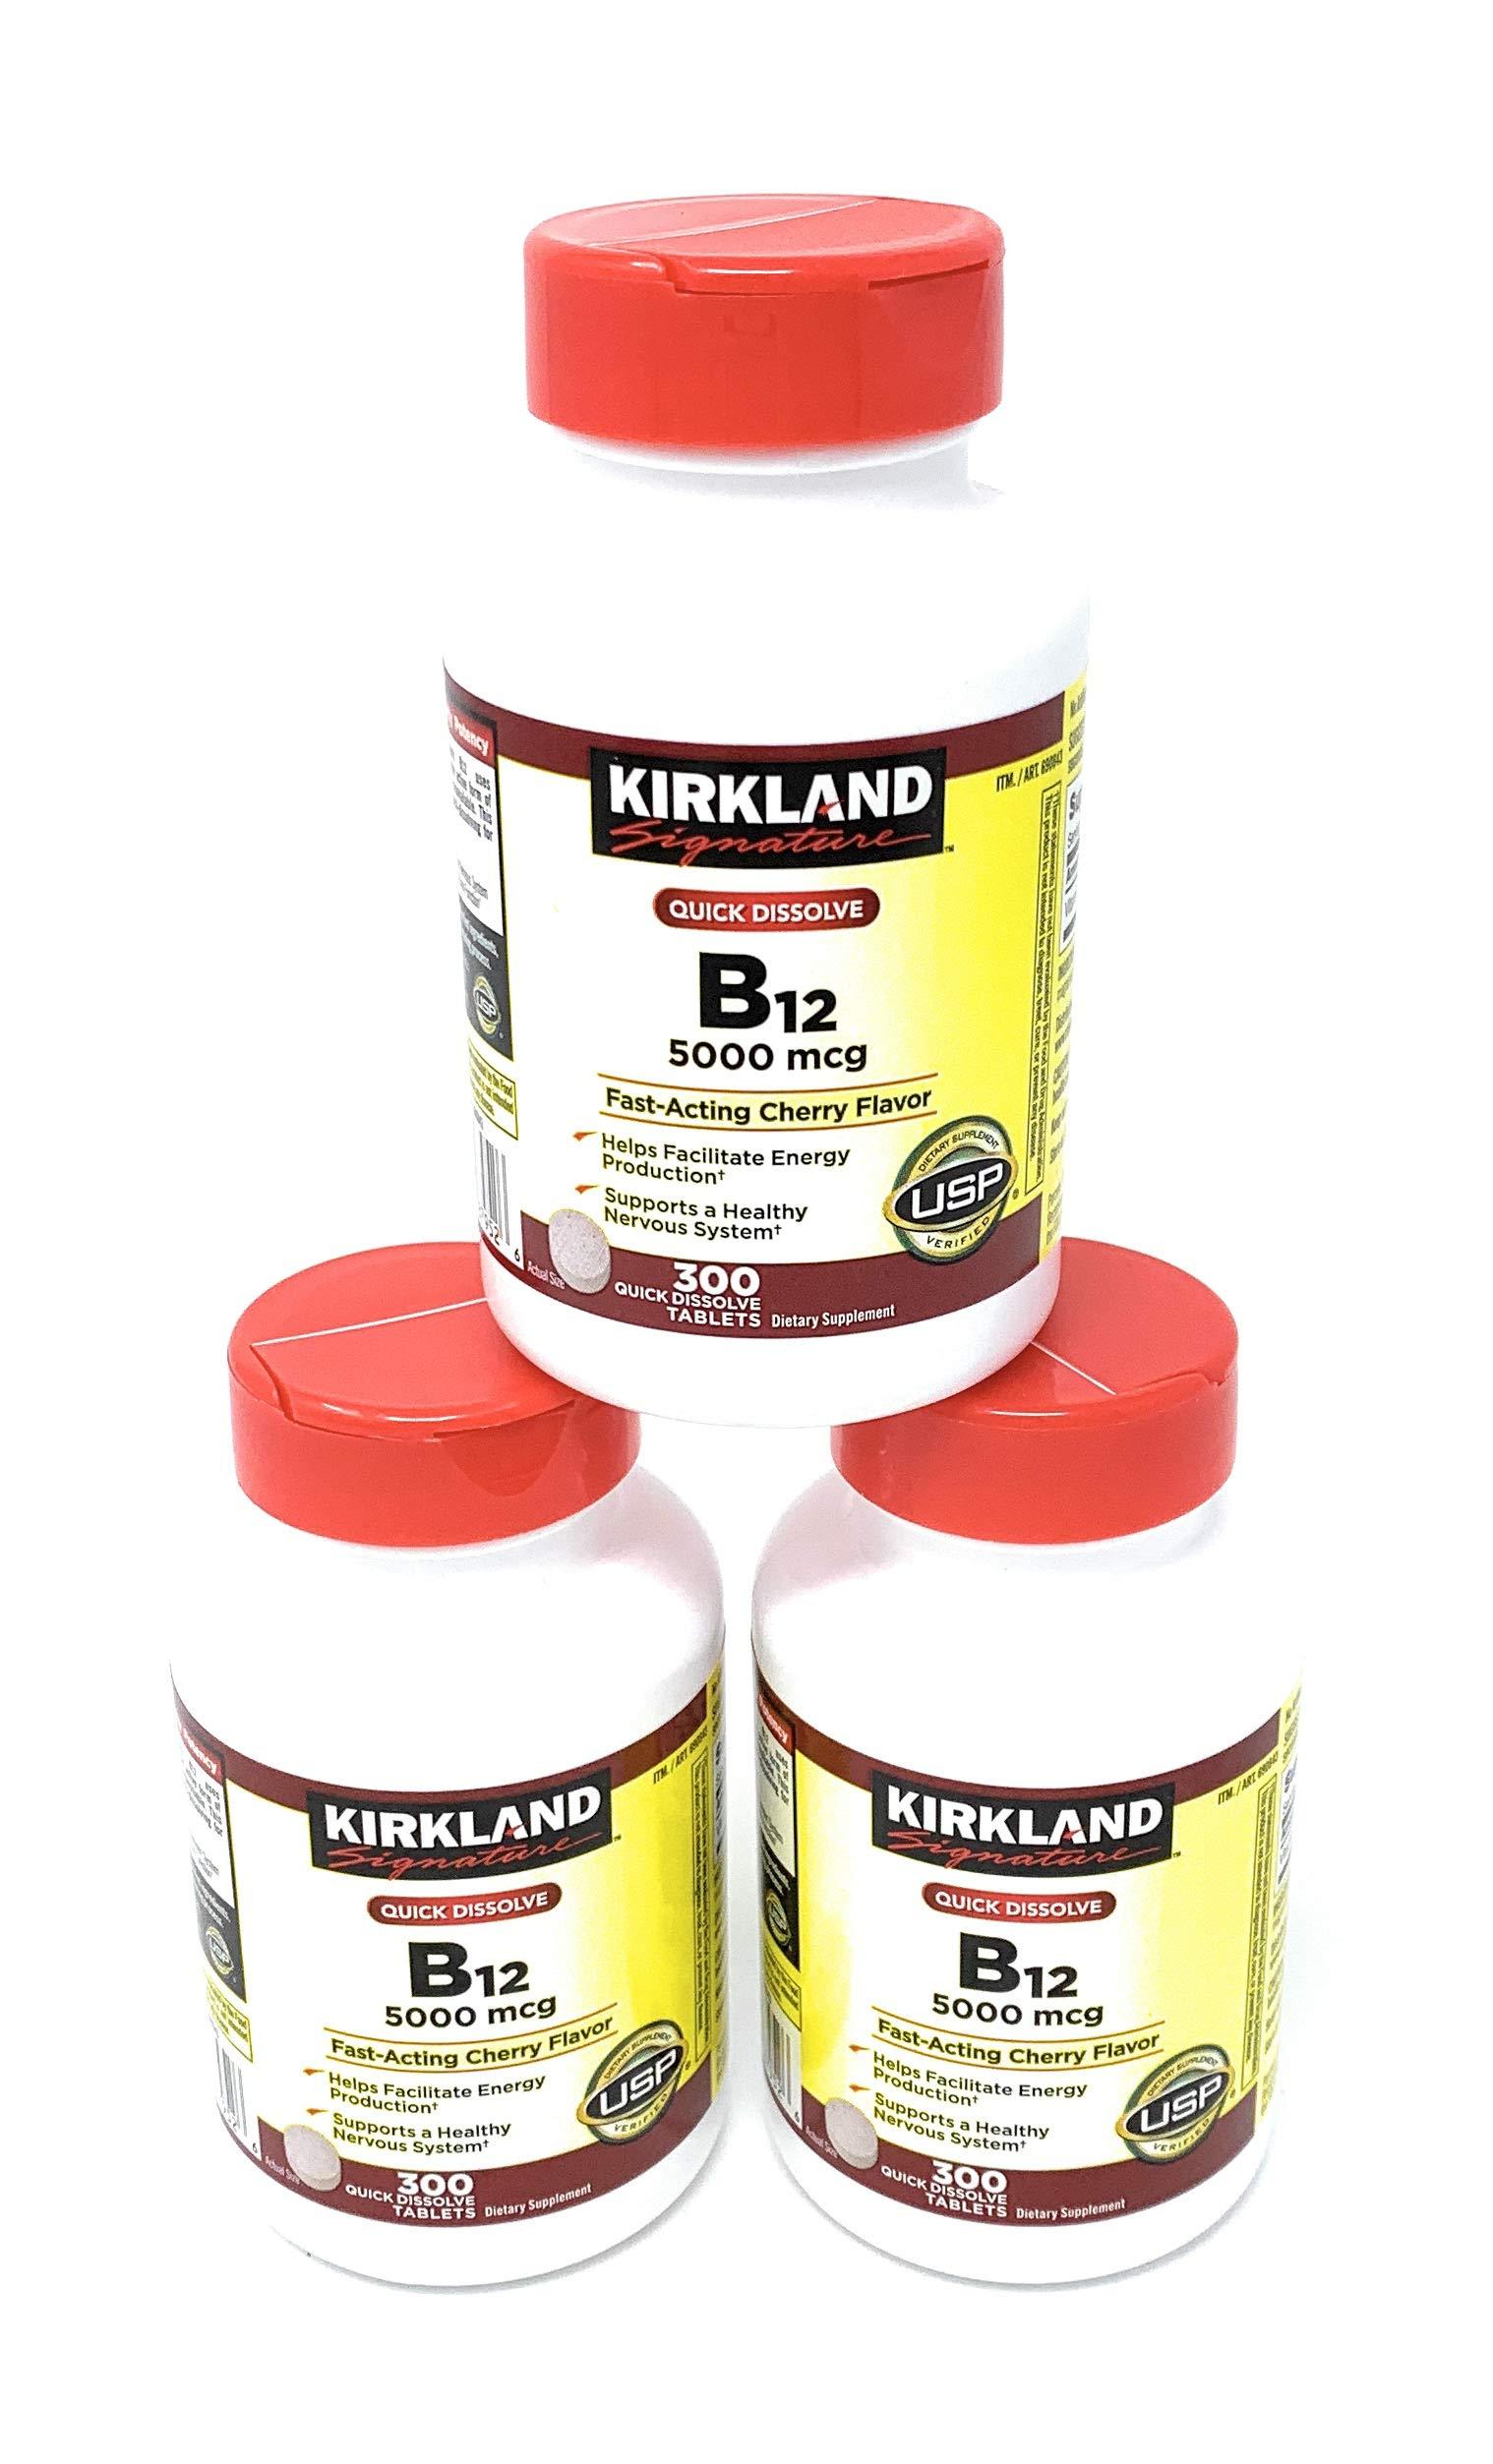 Kirkland Signature Sublingual B-12 5000 mcg, 3 Bottles (300 Tablets)